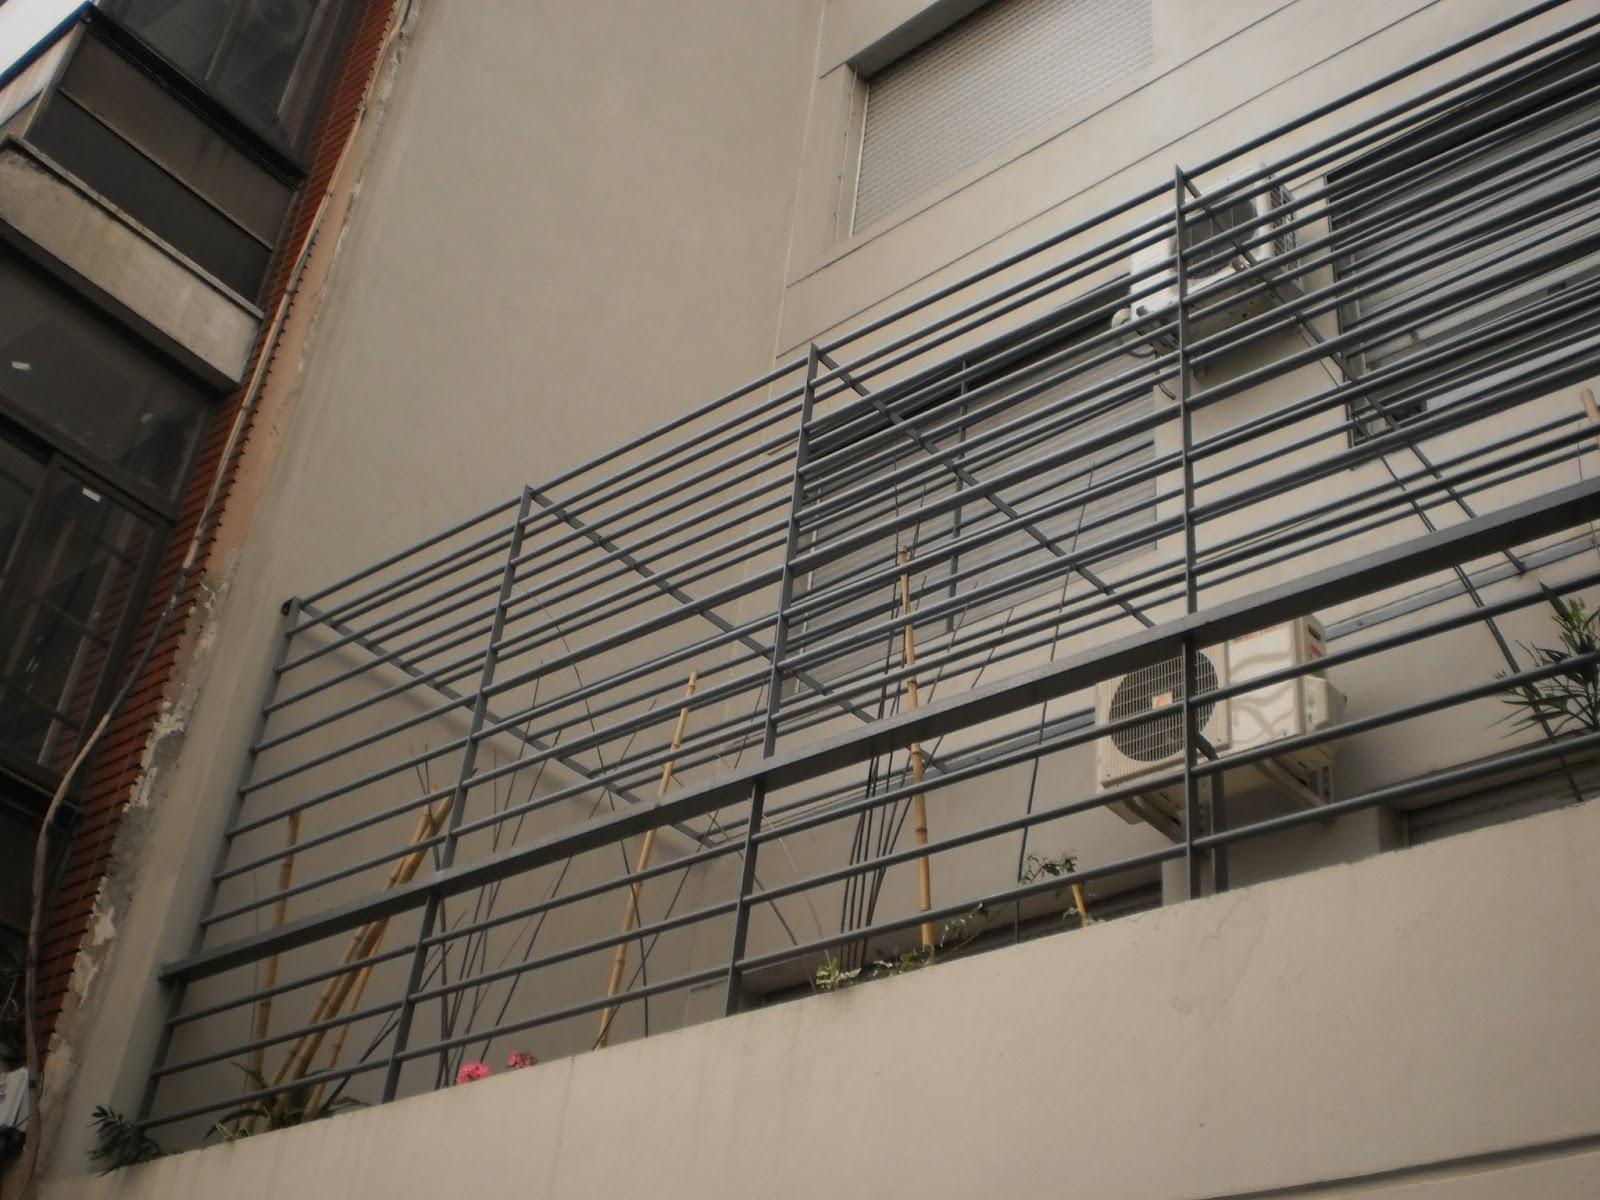 Herrer a hefesto capital federal buenos aires caba - Cerramiento de balcon ...